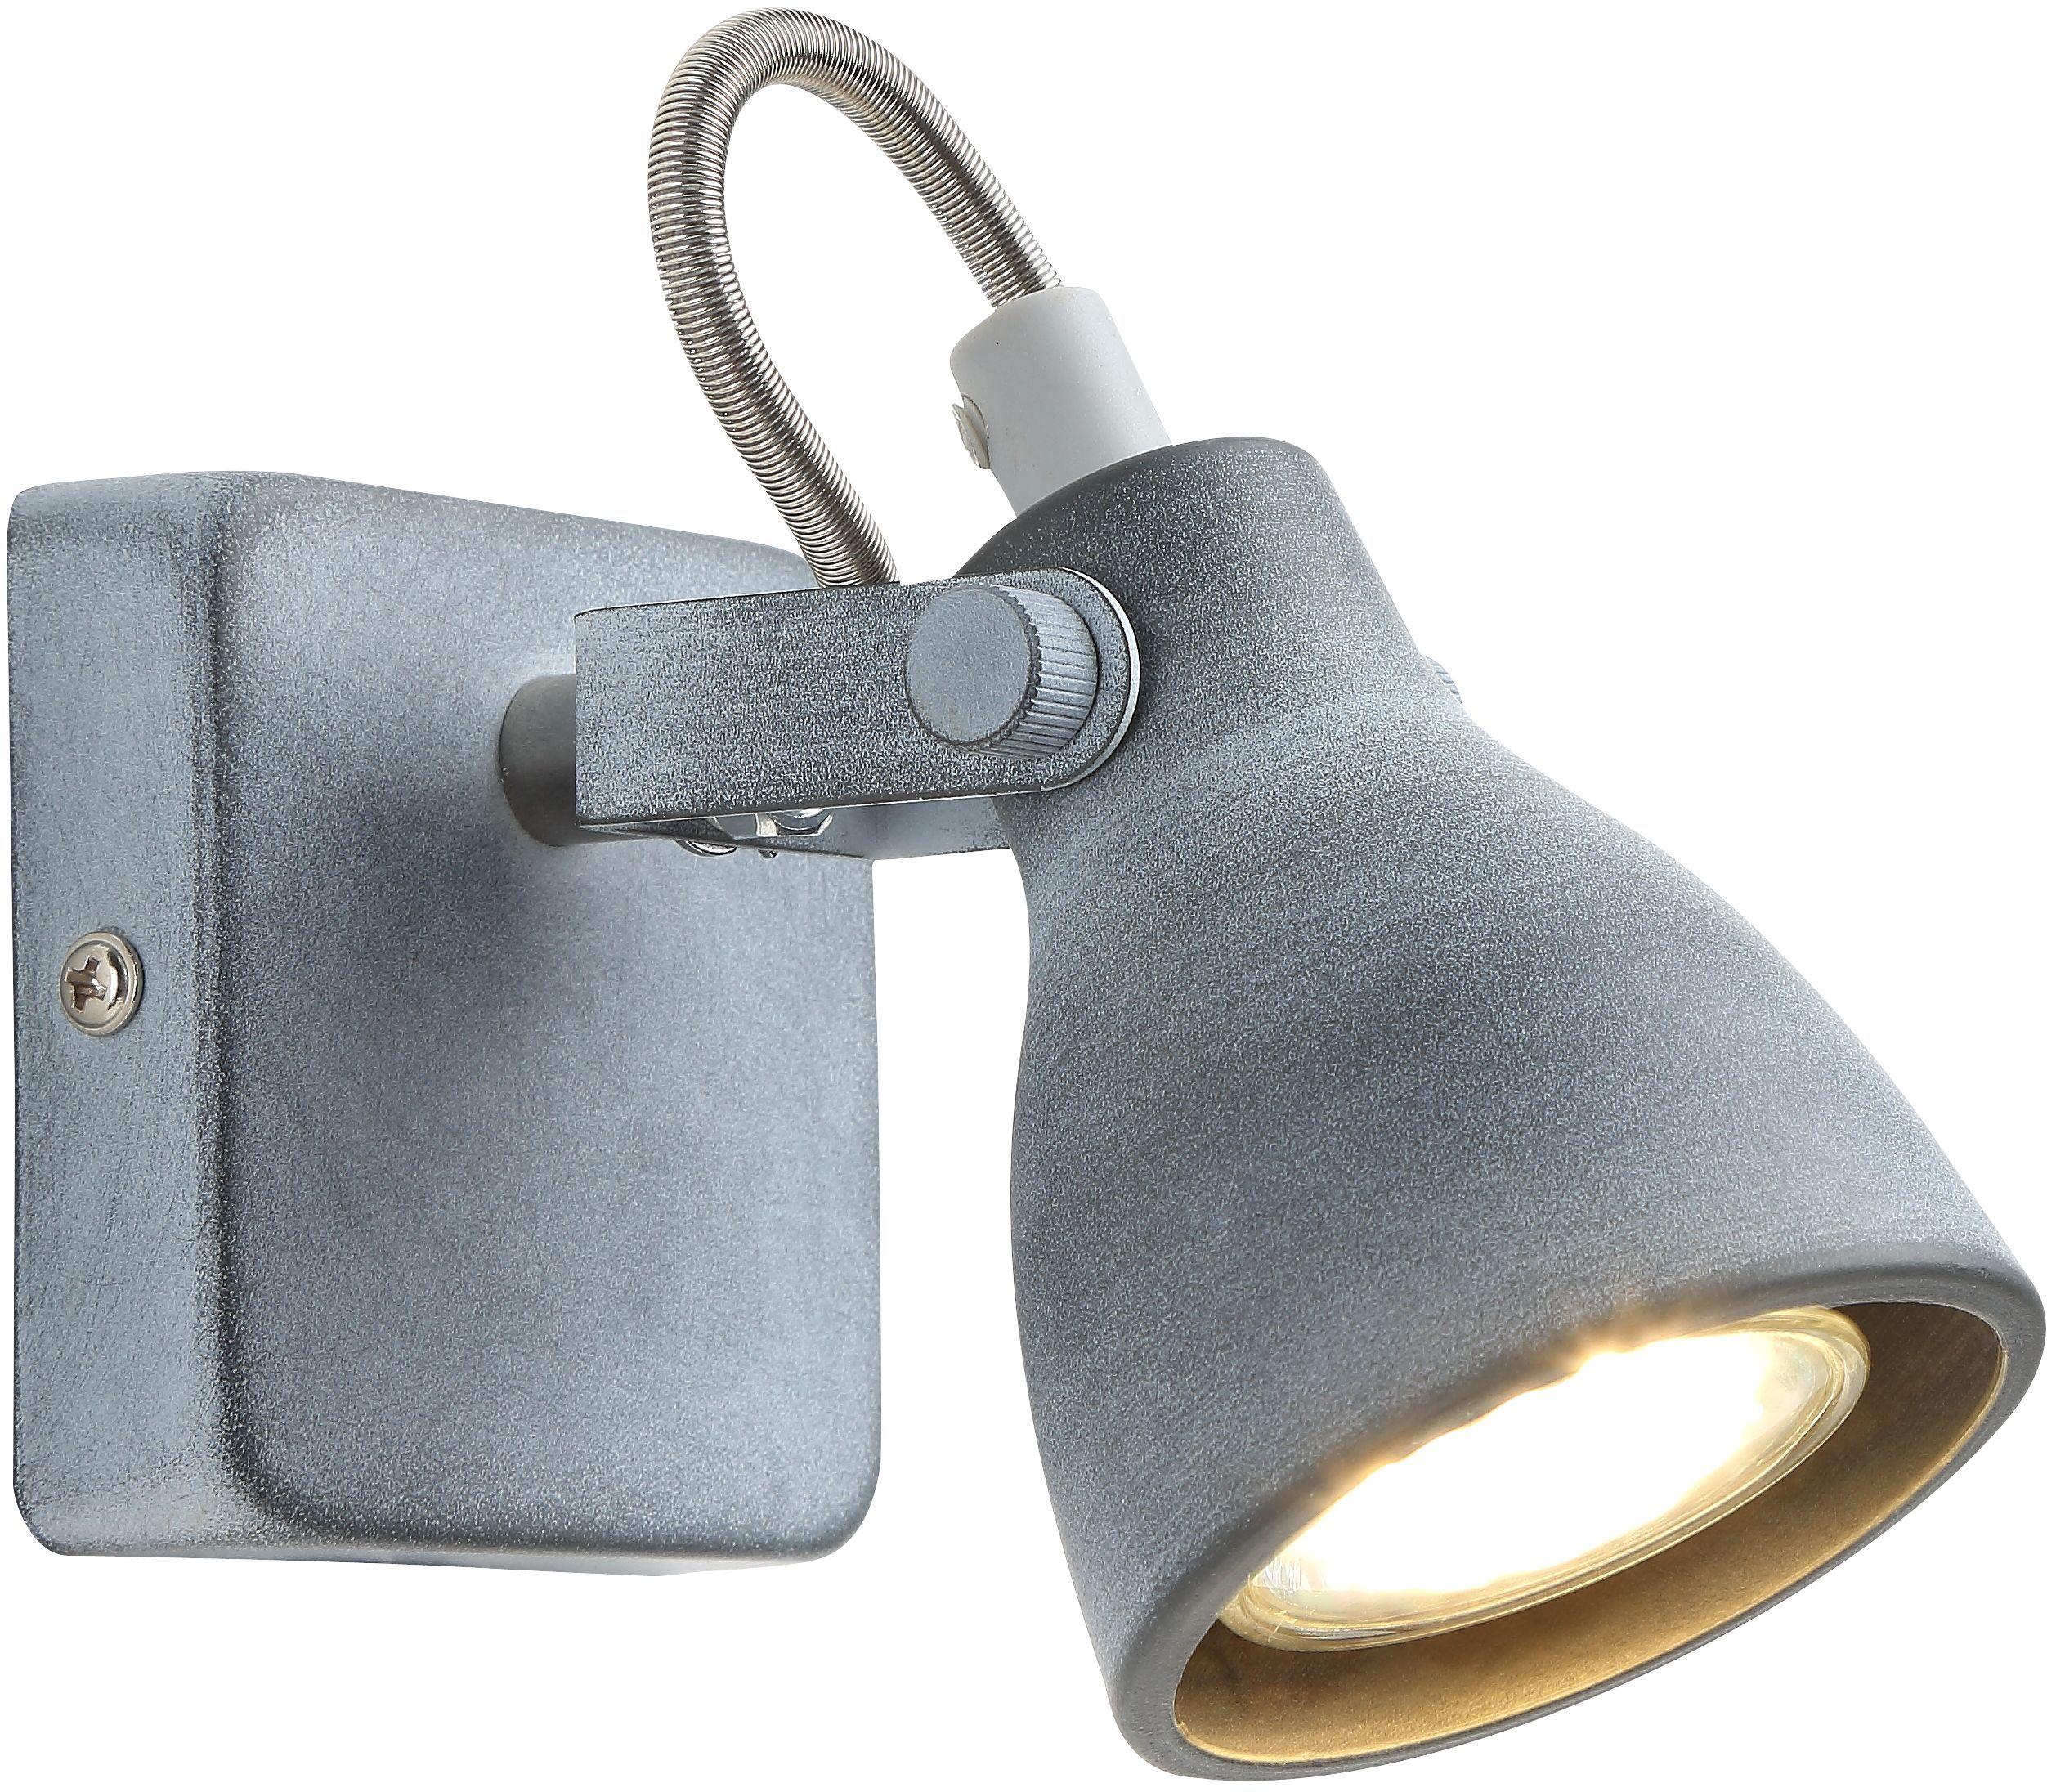 Candellux ASH 91-64394 kinkiet lampa ścienna szary mat regulacja klosza 1X40W GU10 7cm